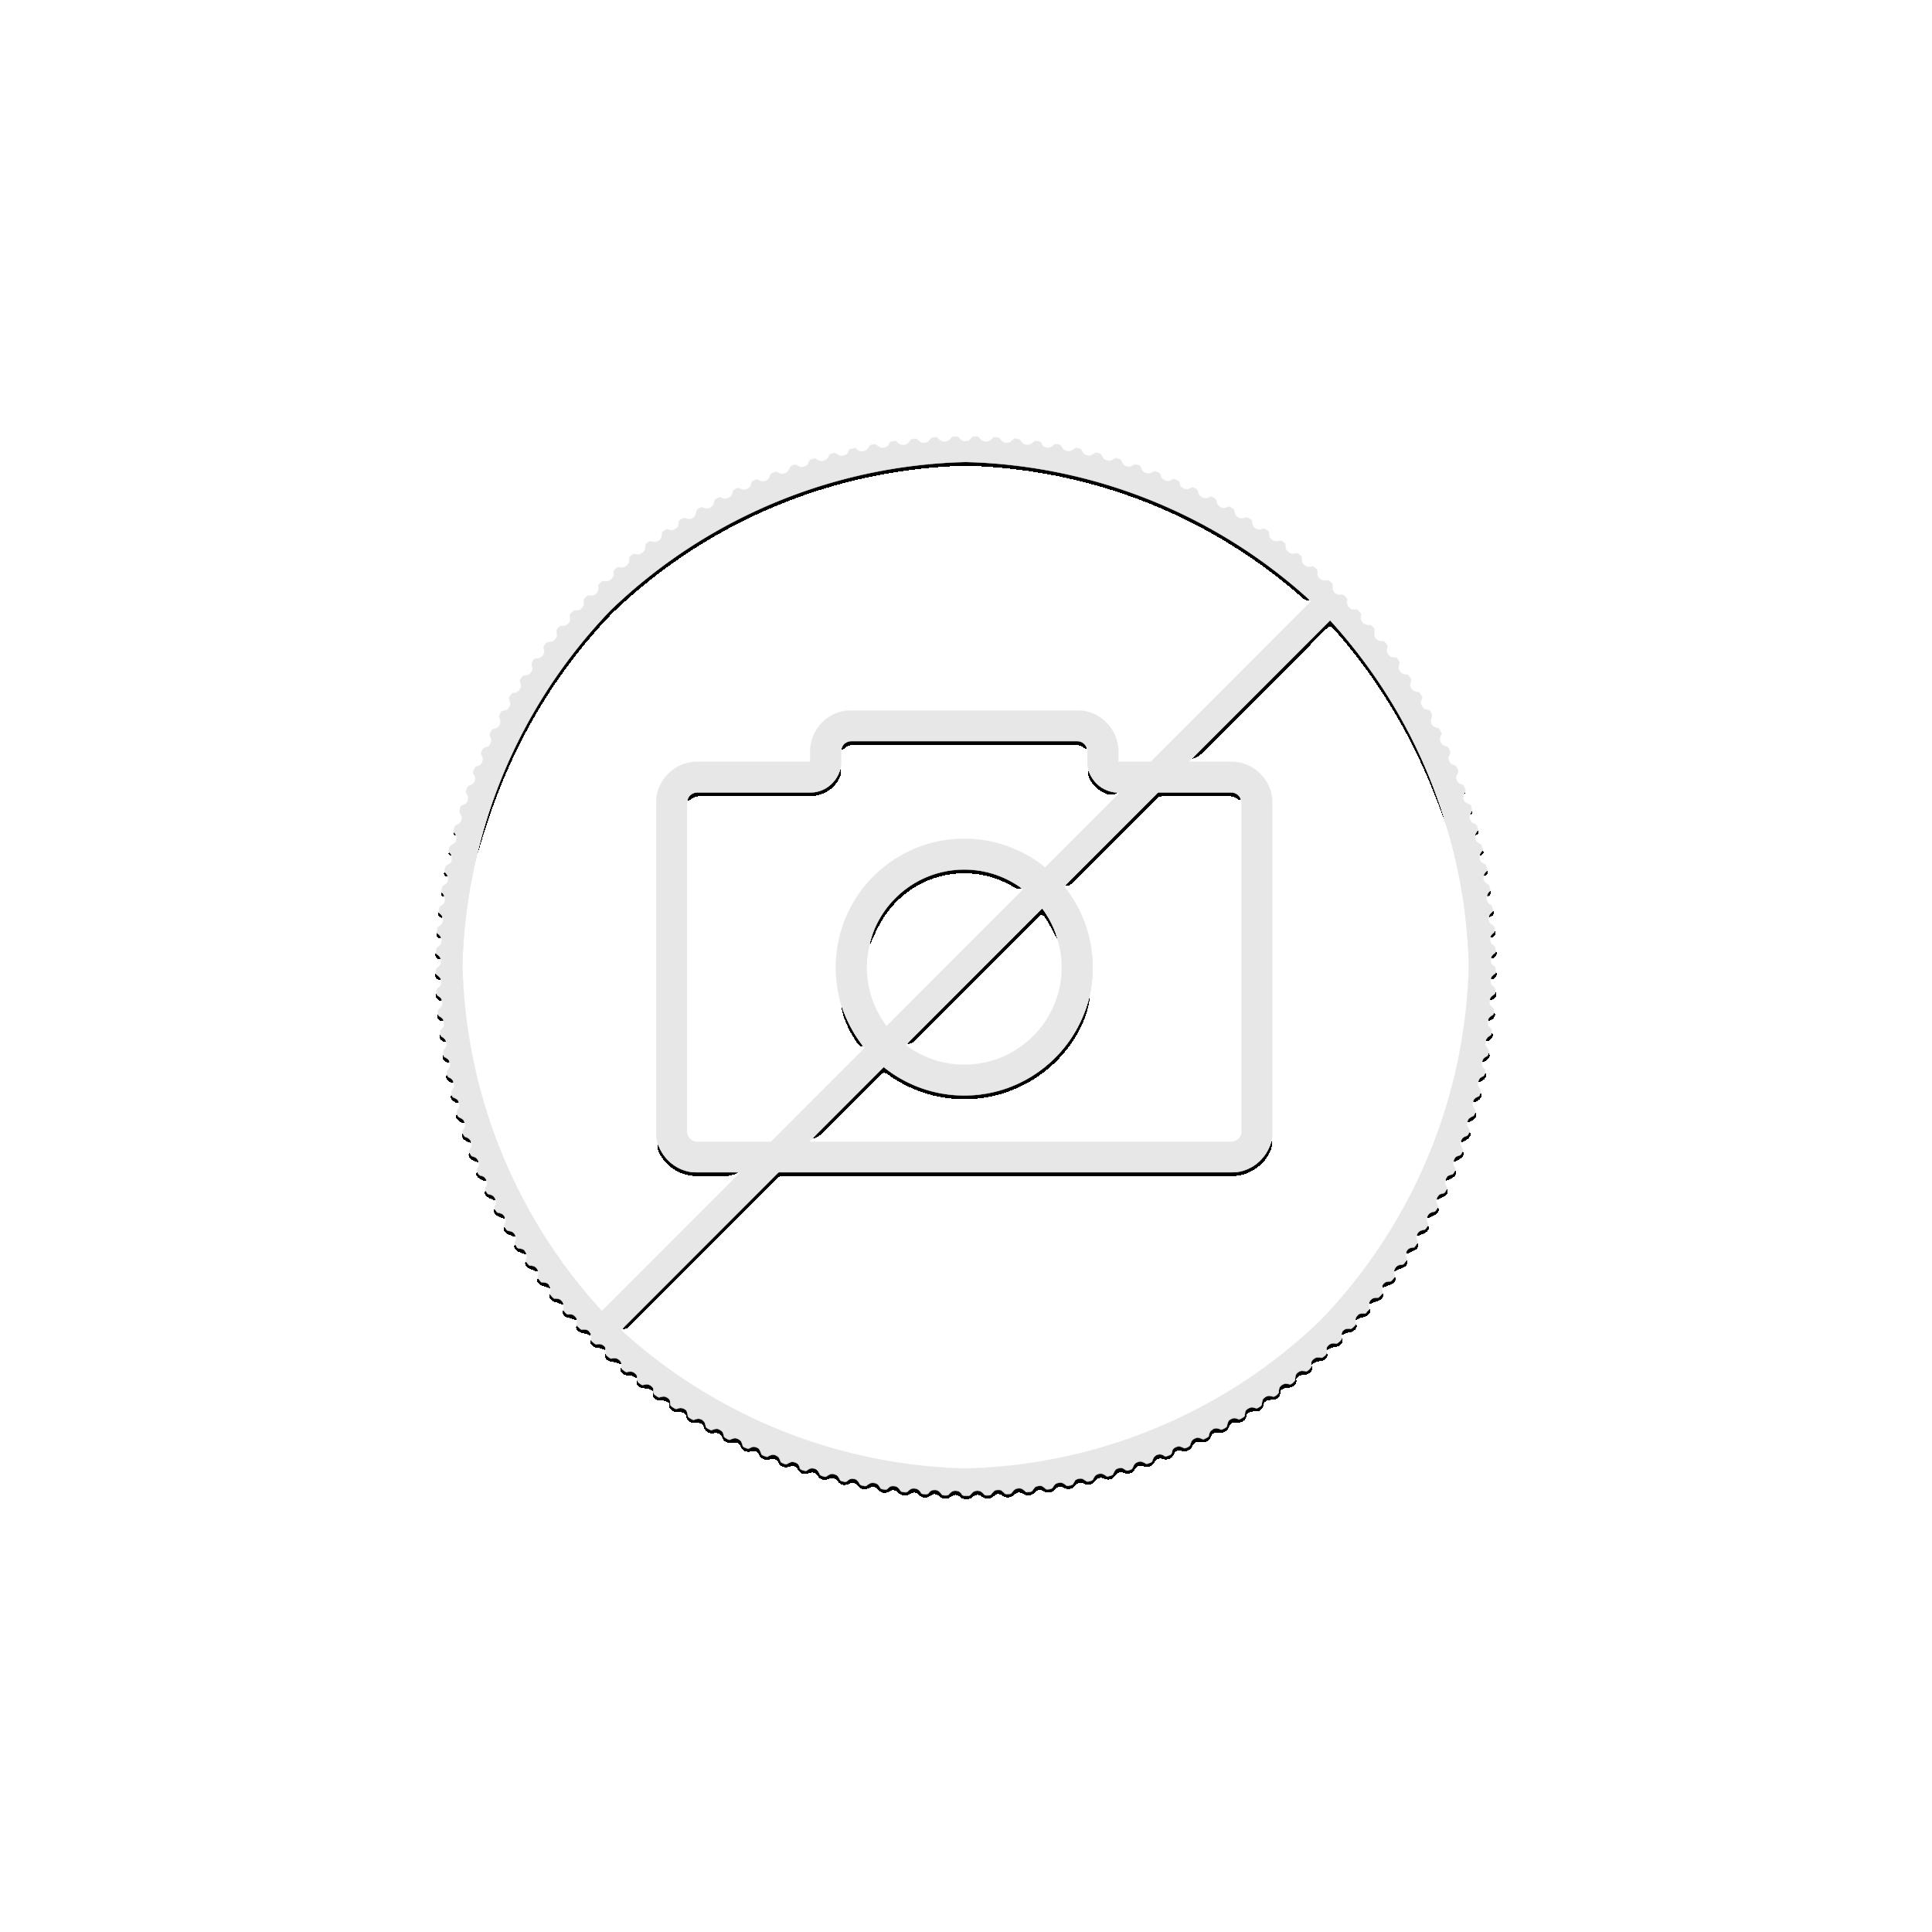 Zilver Koala kilo munt 2009